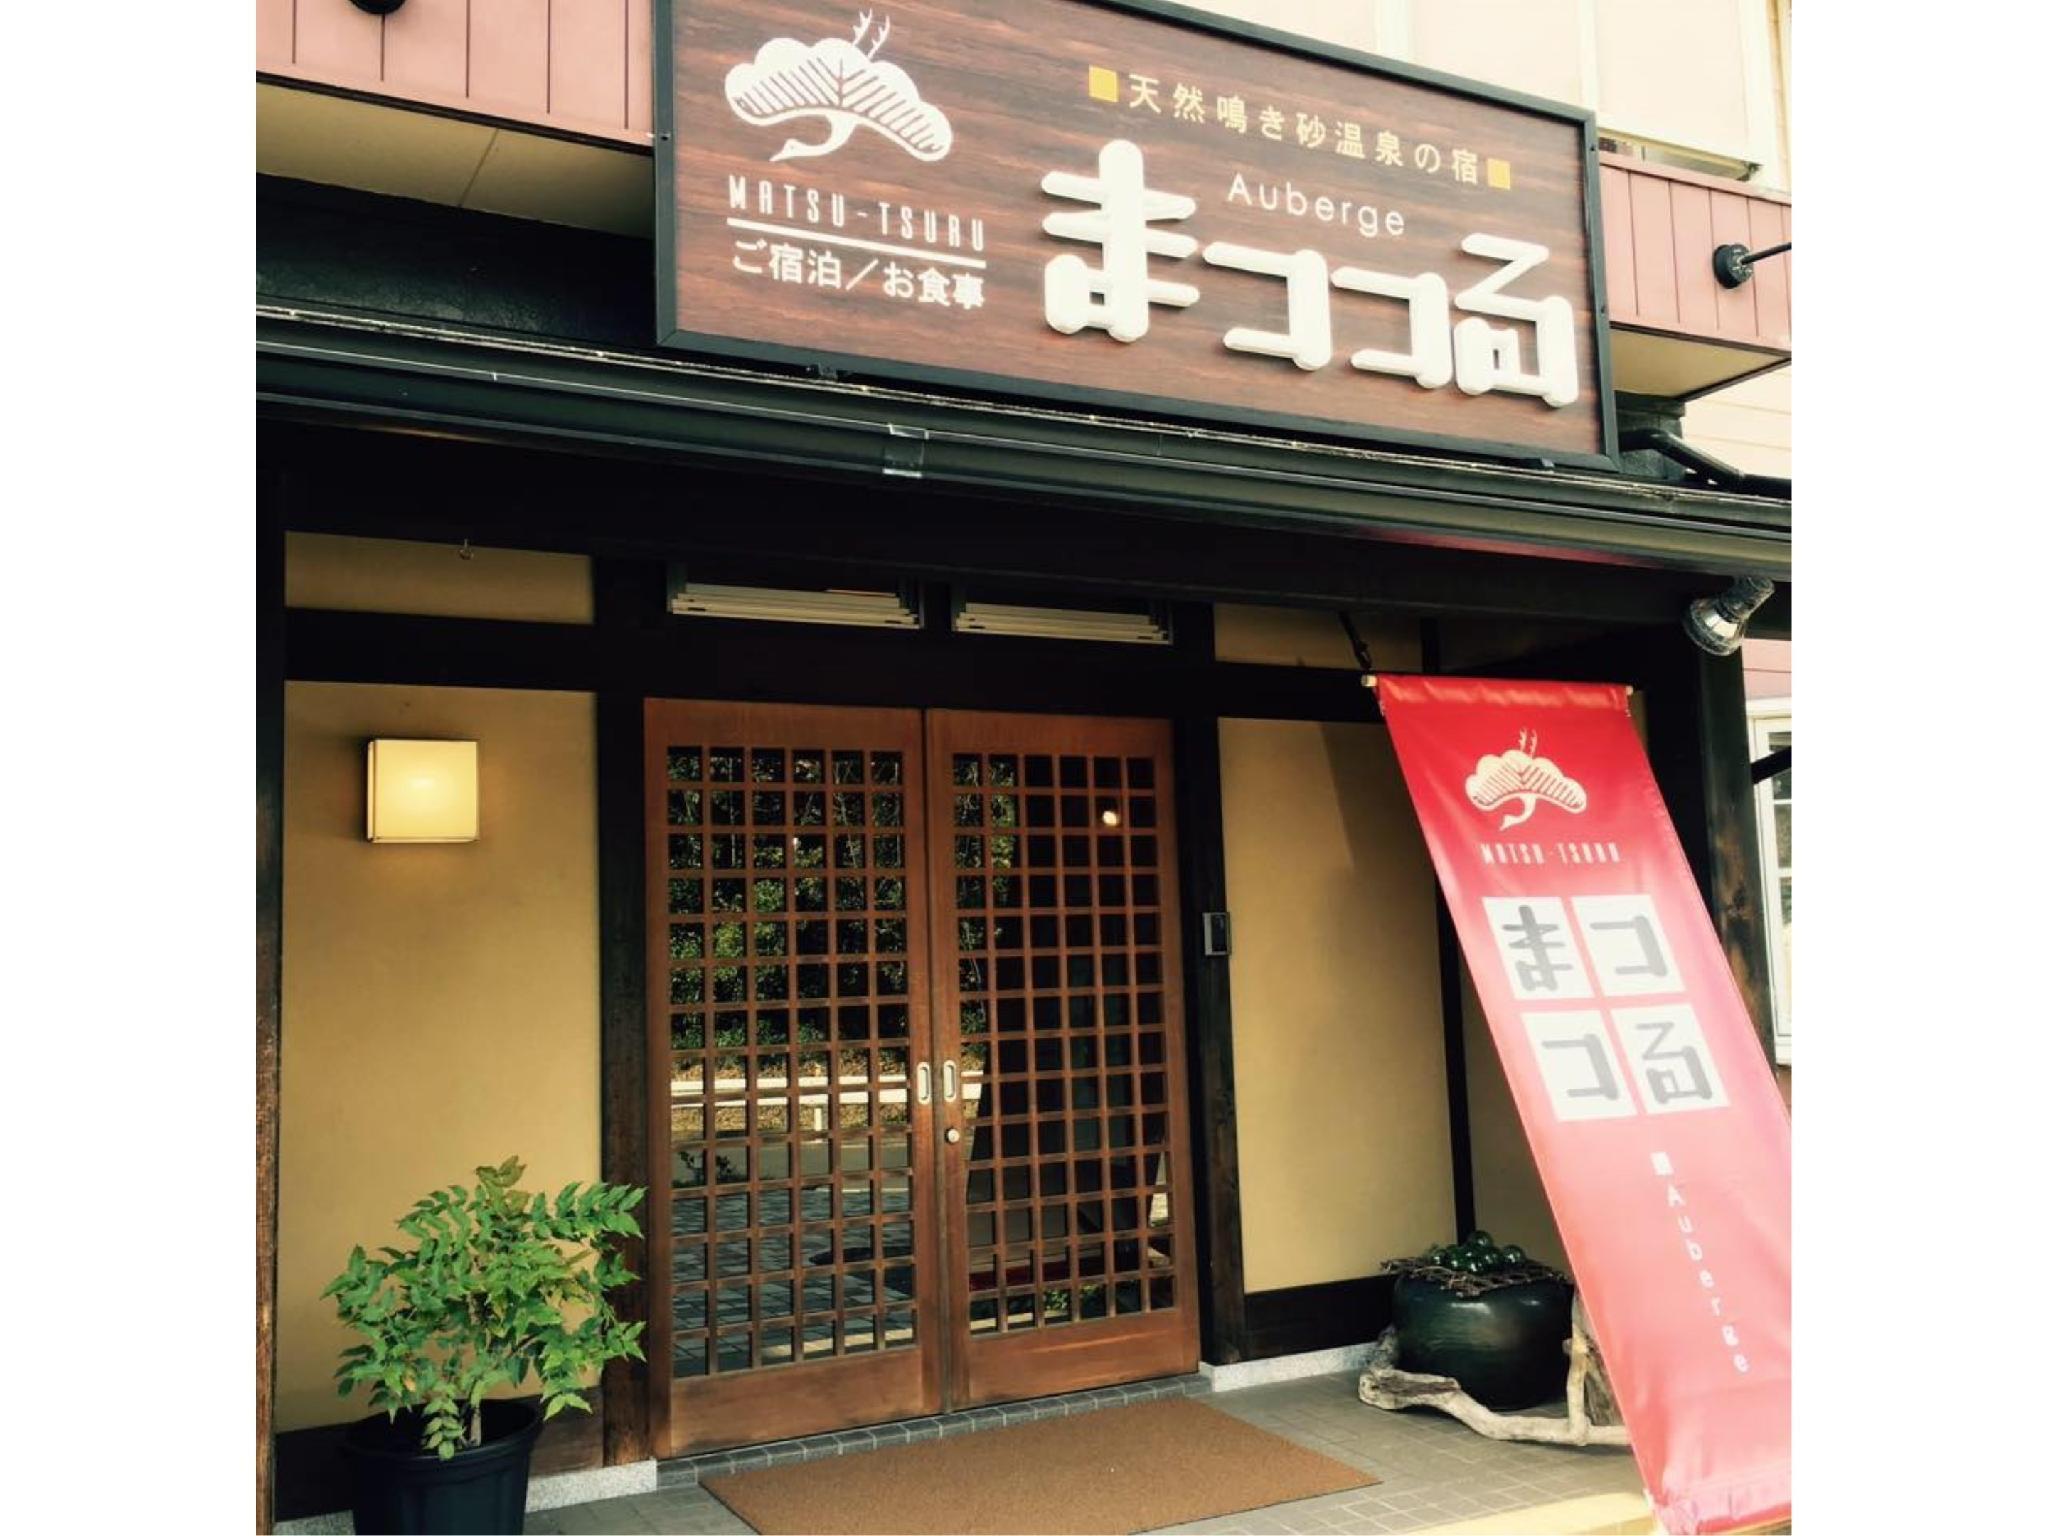 Japanese Auberge Matsu Tsuru